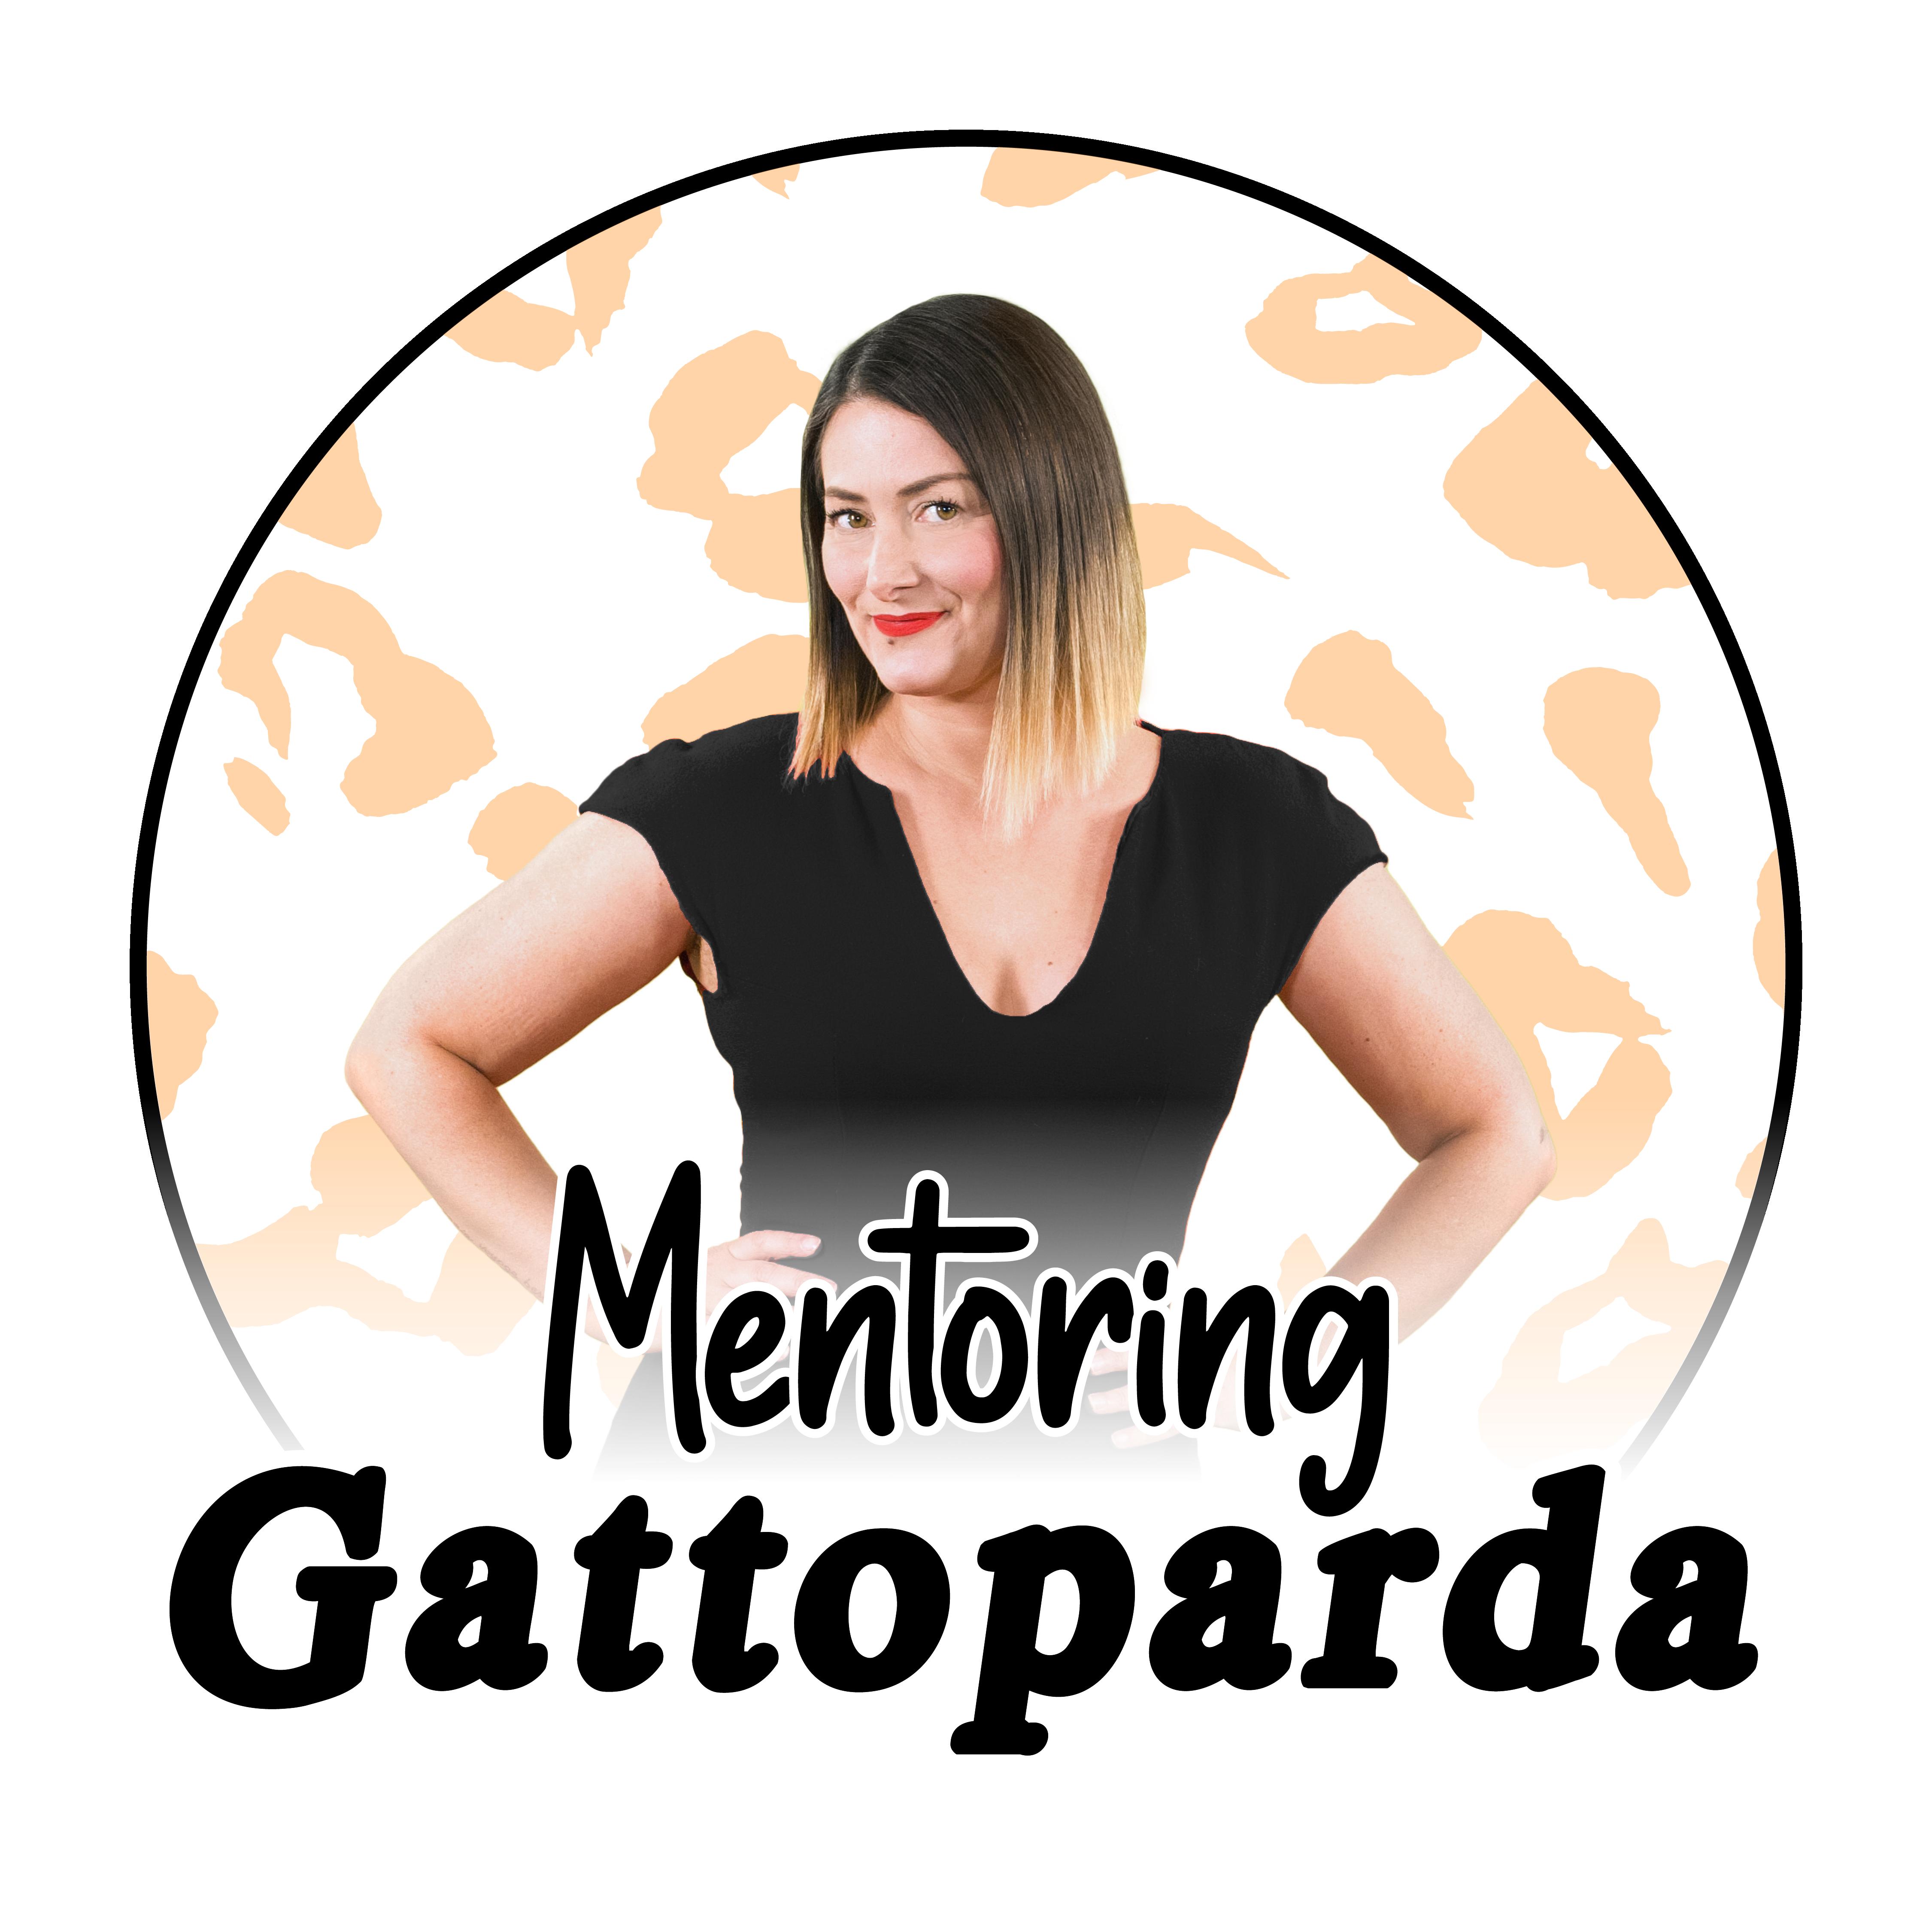 Gattoparda Mentoring